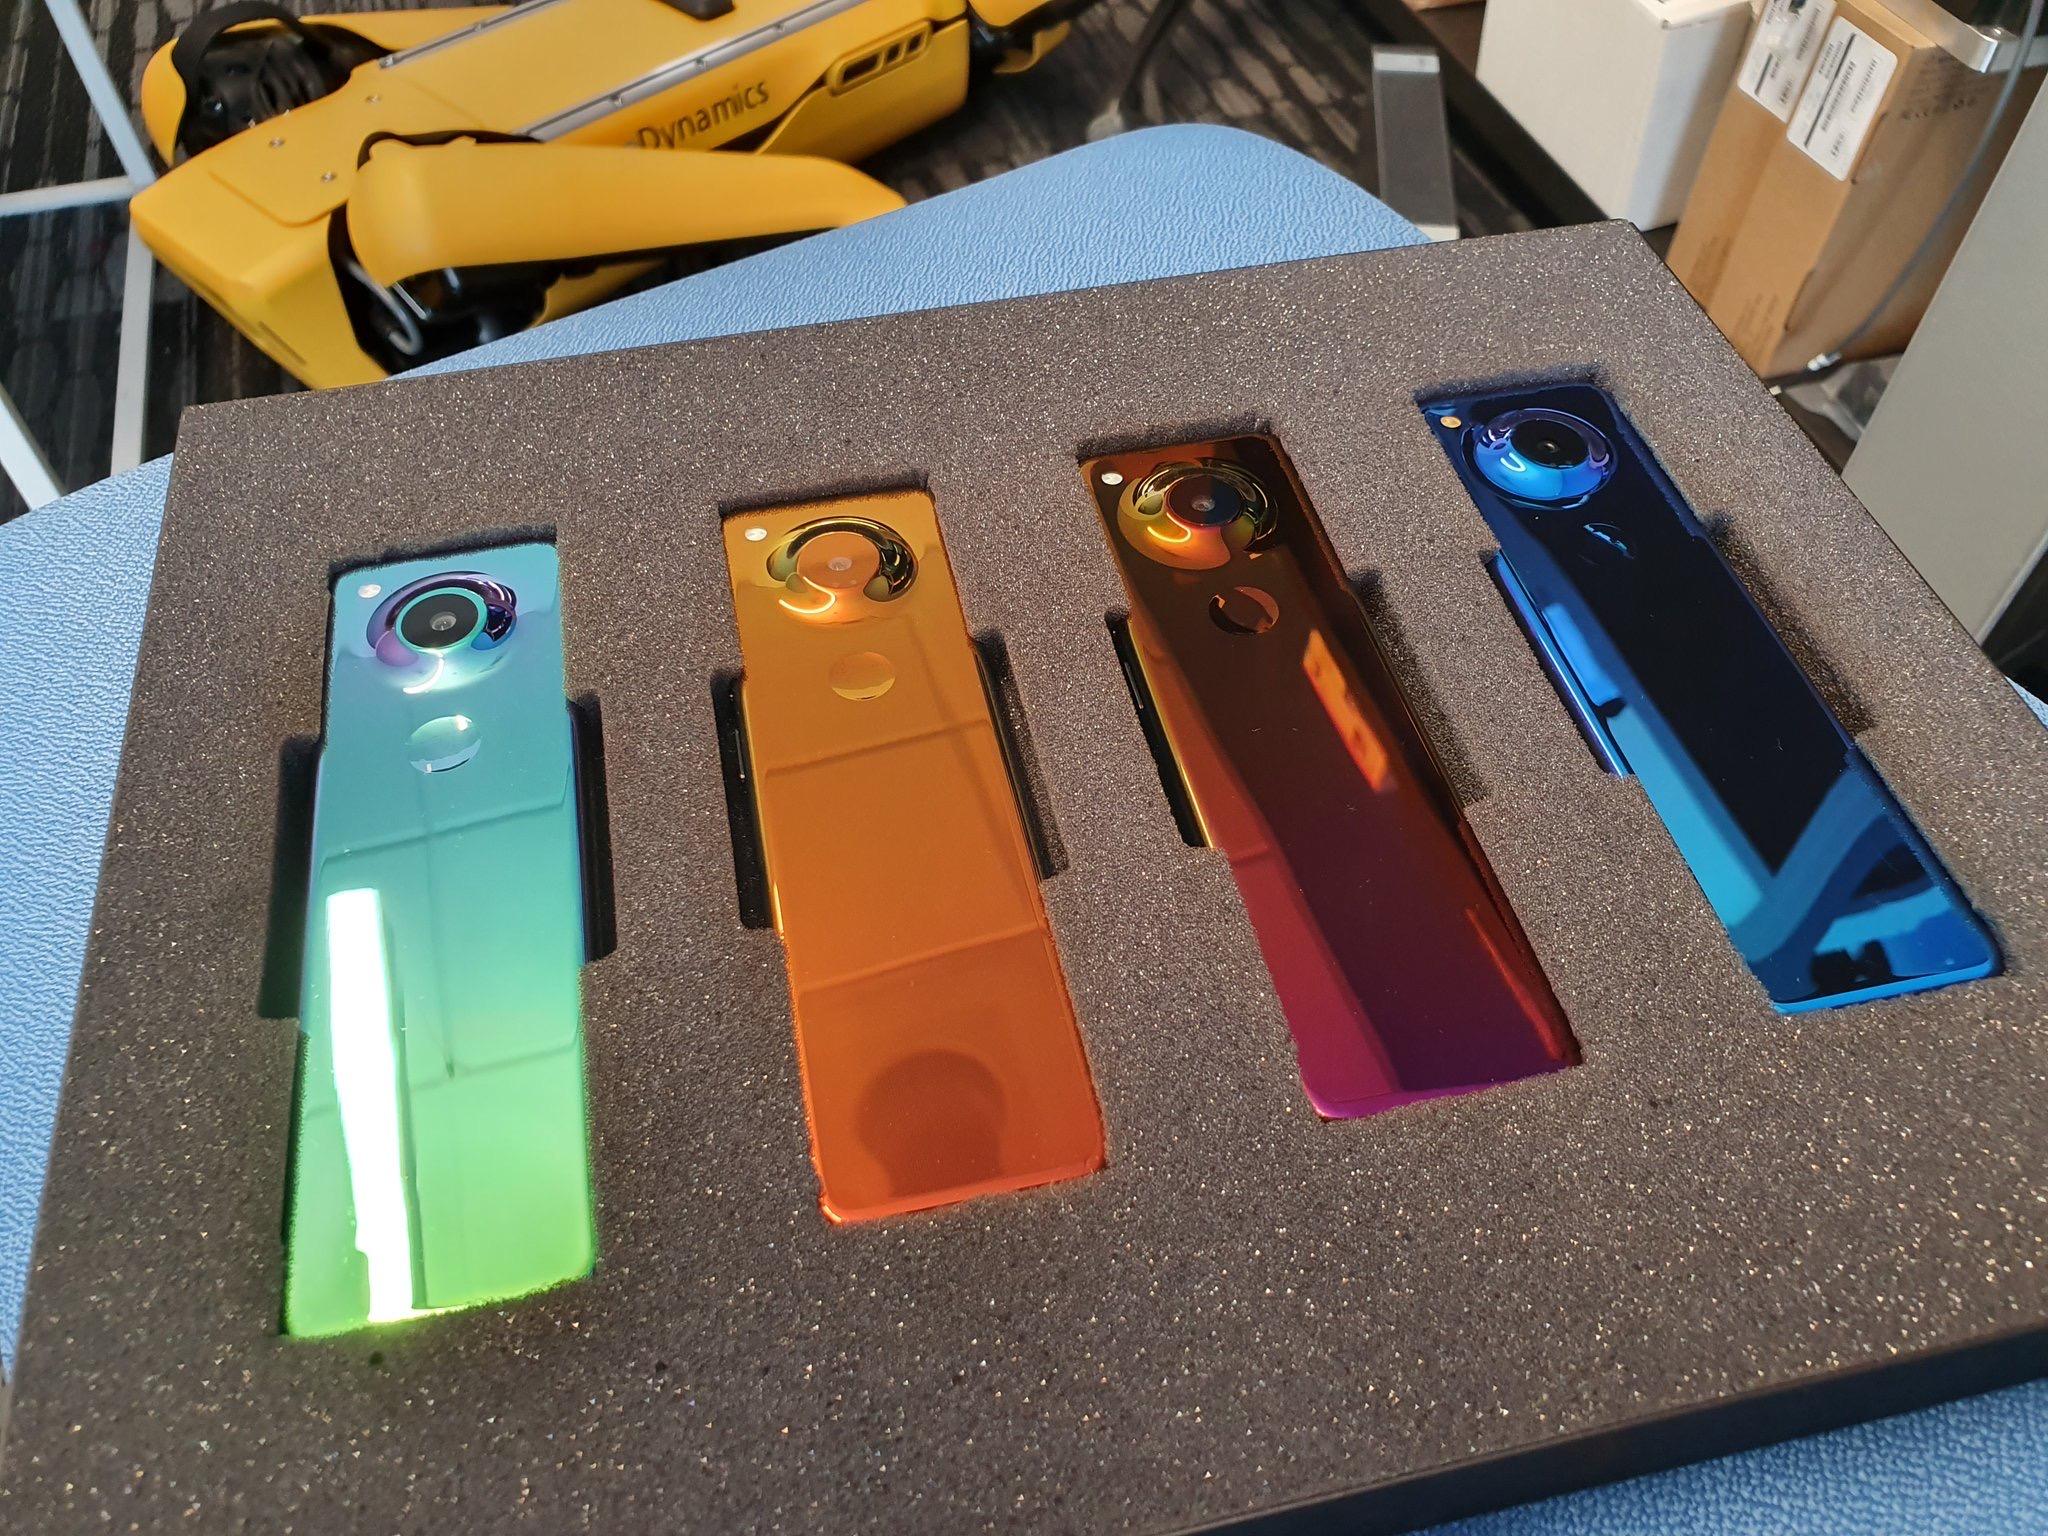 Livebox 5, curieux Essential Phone et Xiaomi Redmi 8 – Tech'spresso